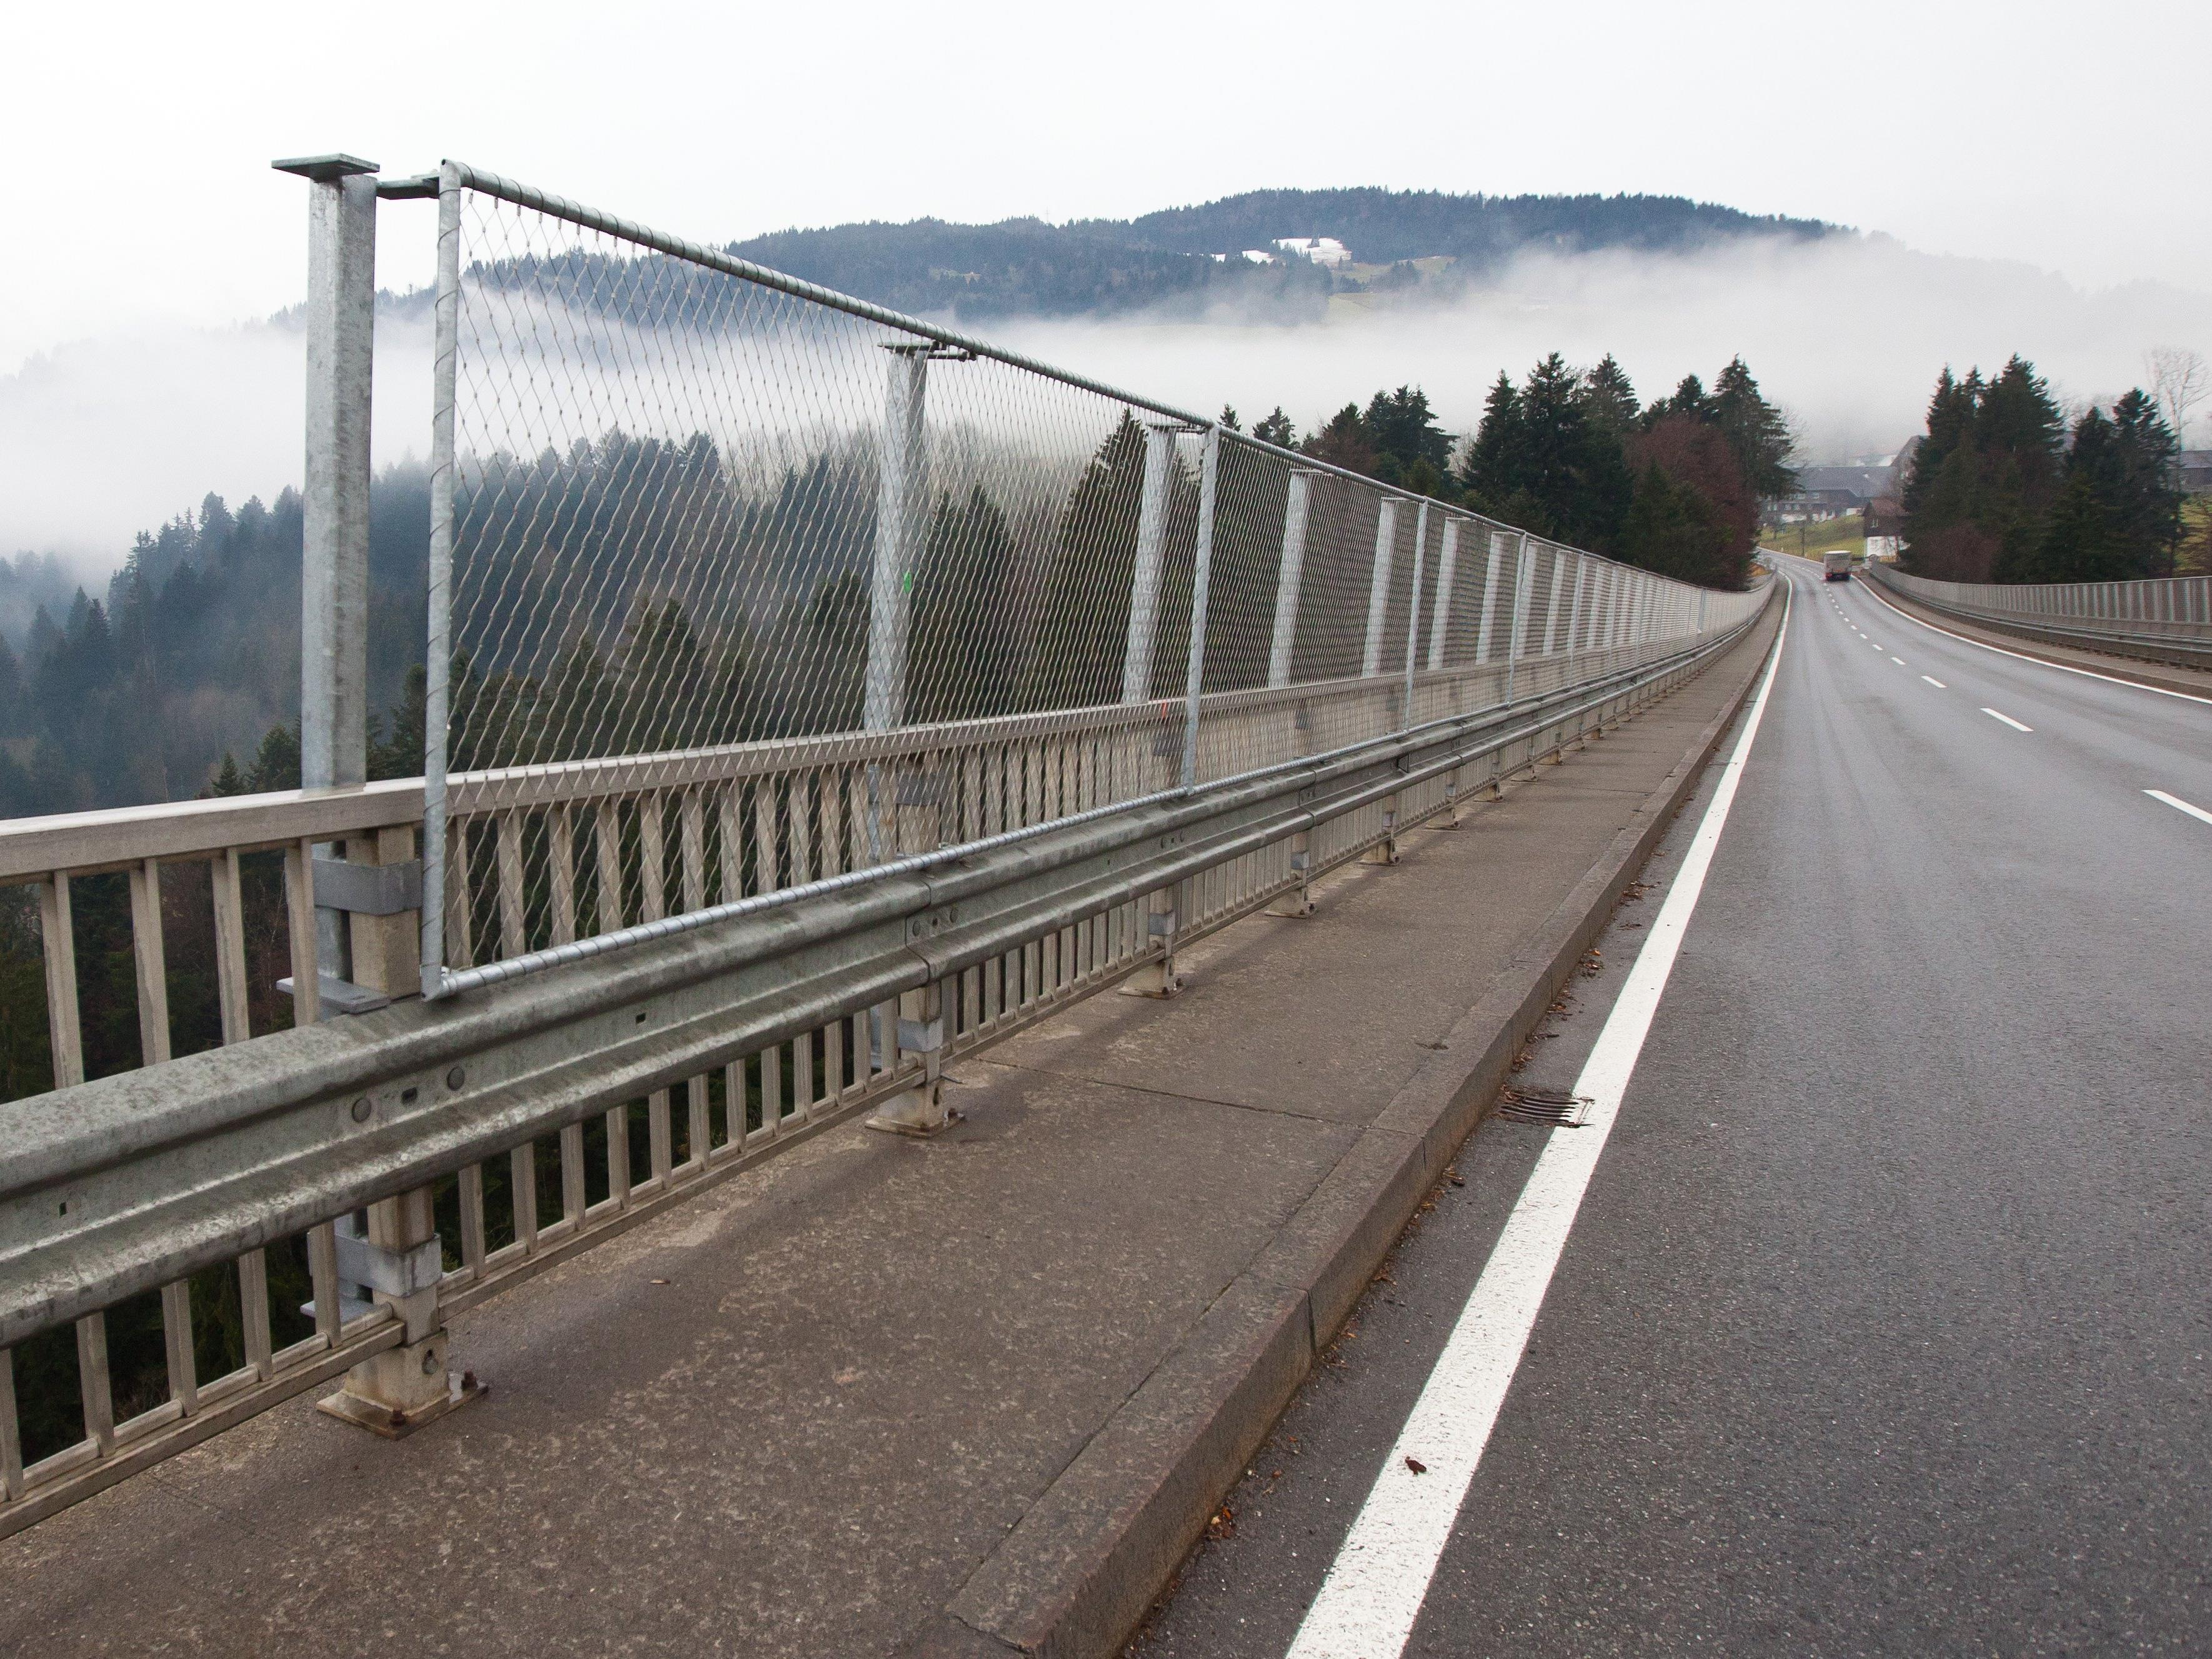 An der Lingenauer Hochbrücke werden Bauarbeiten durchgeführt.